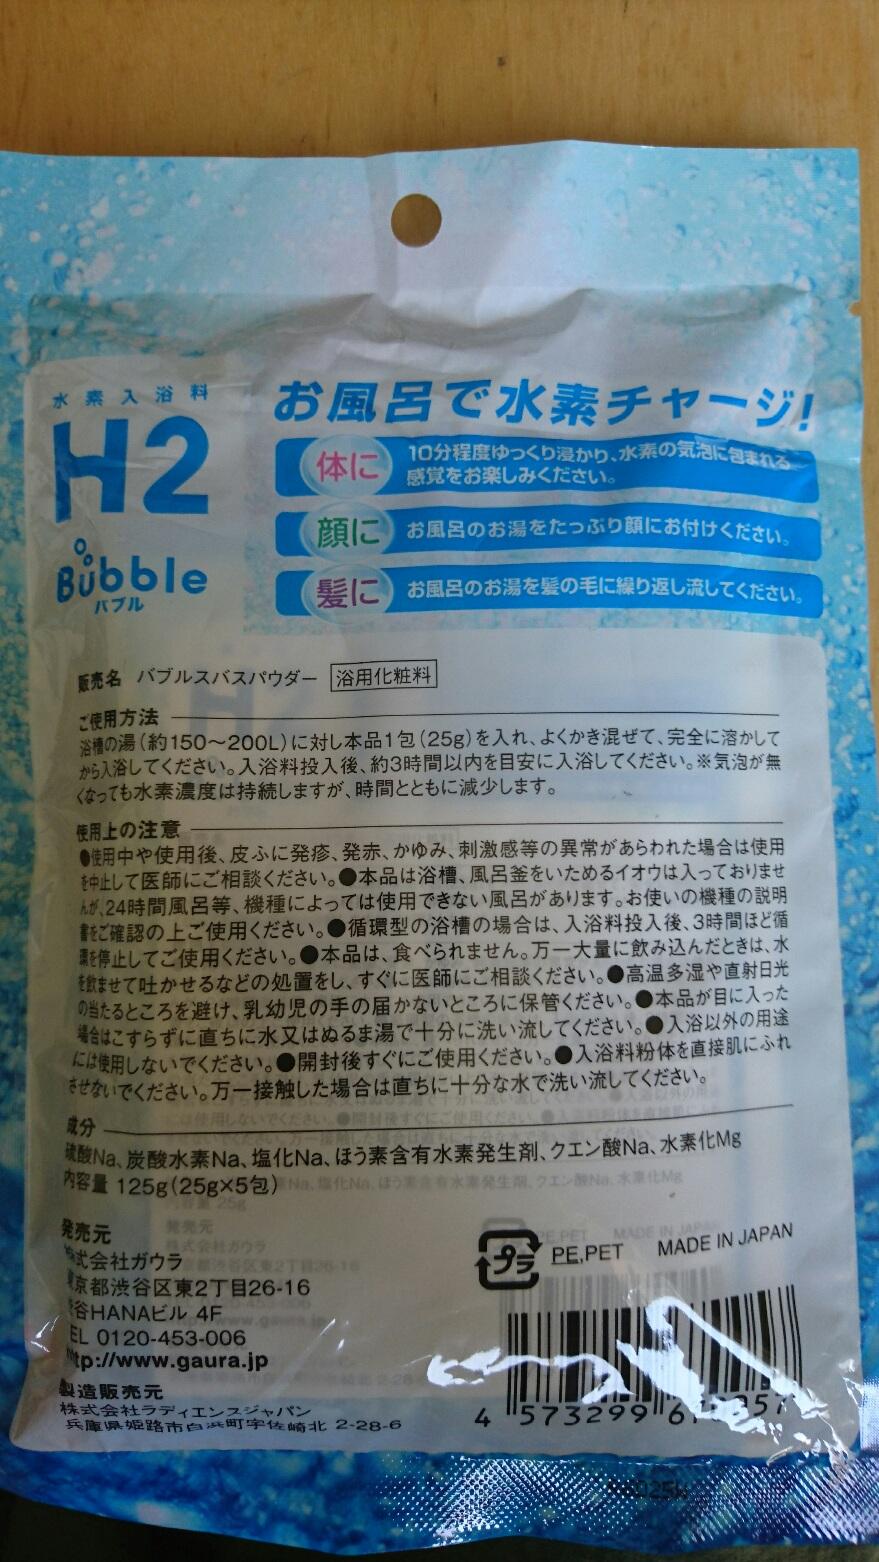 h22.JPG